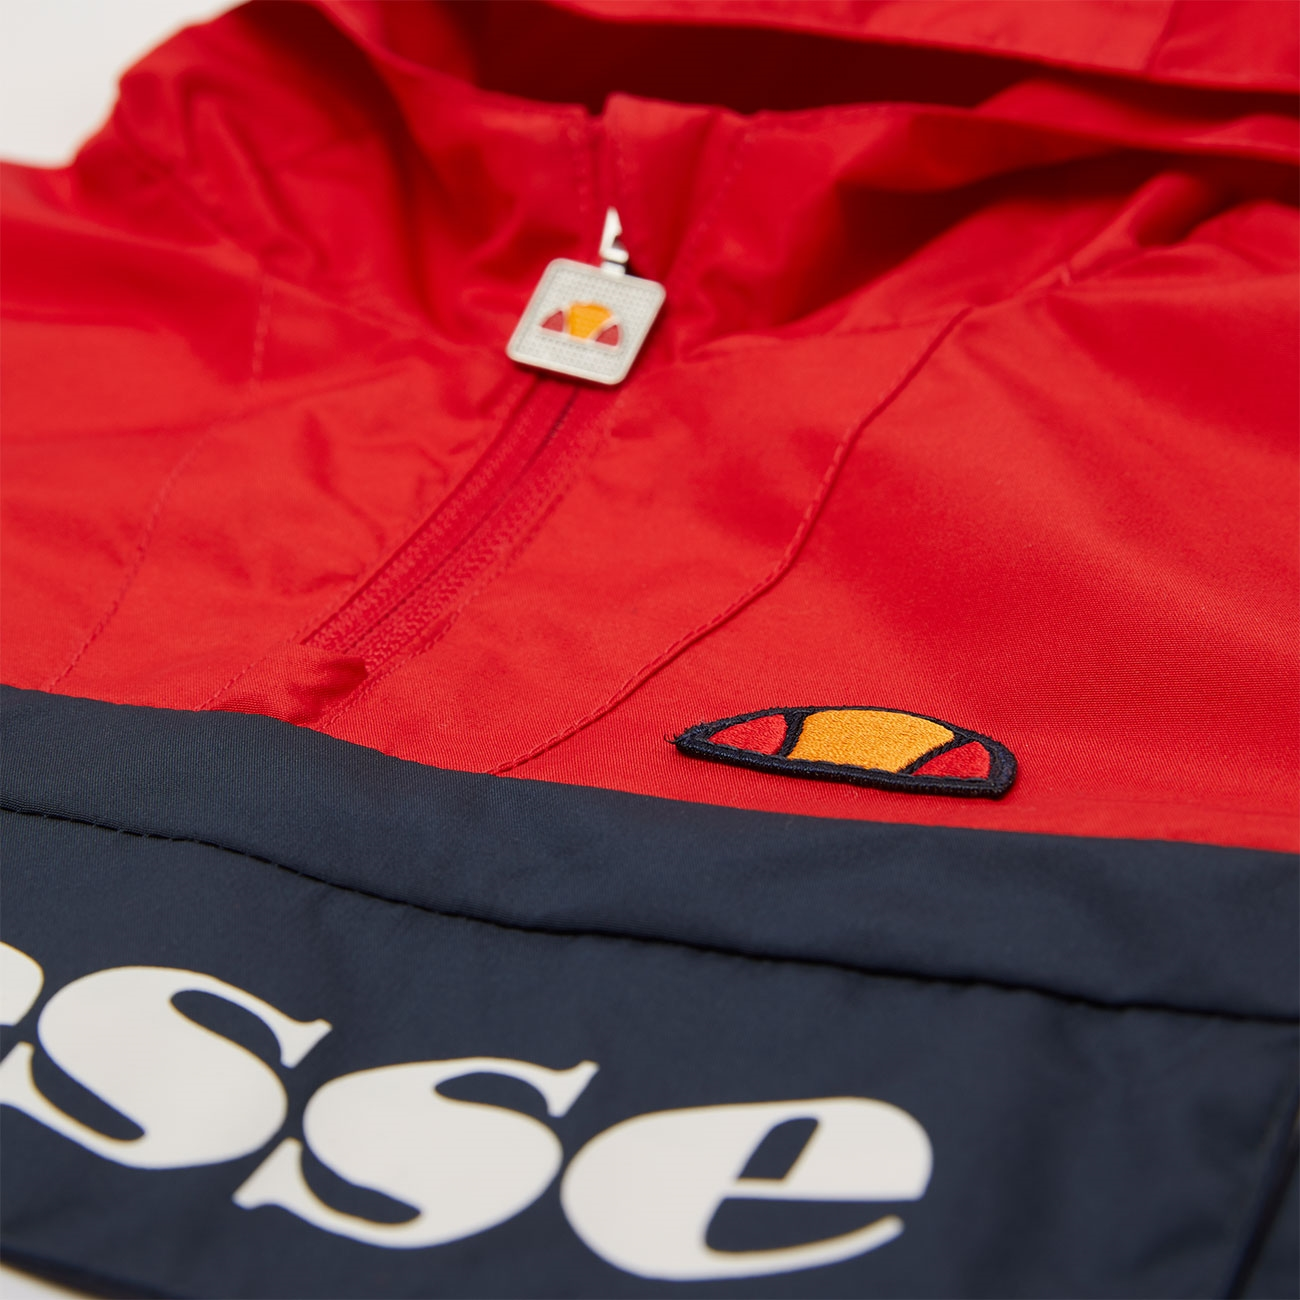 Ellesse Red Granios Windrunner Jacket